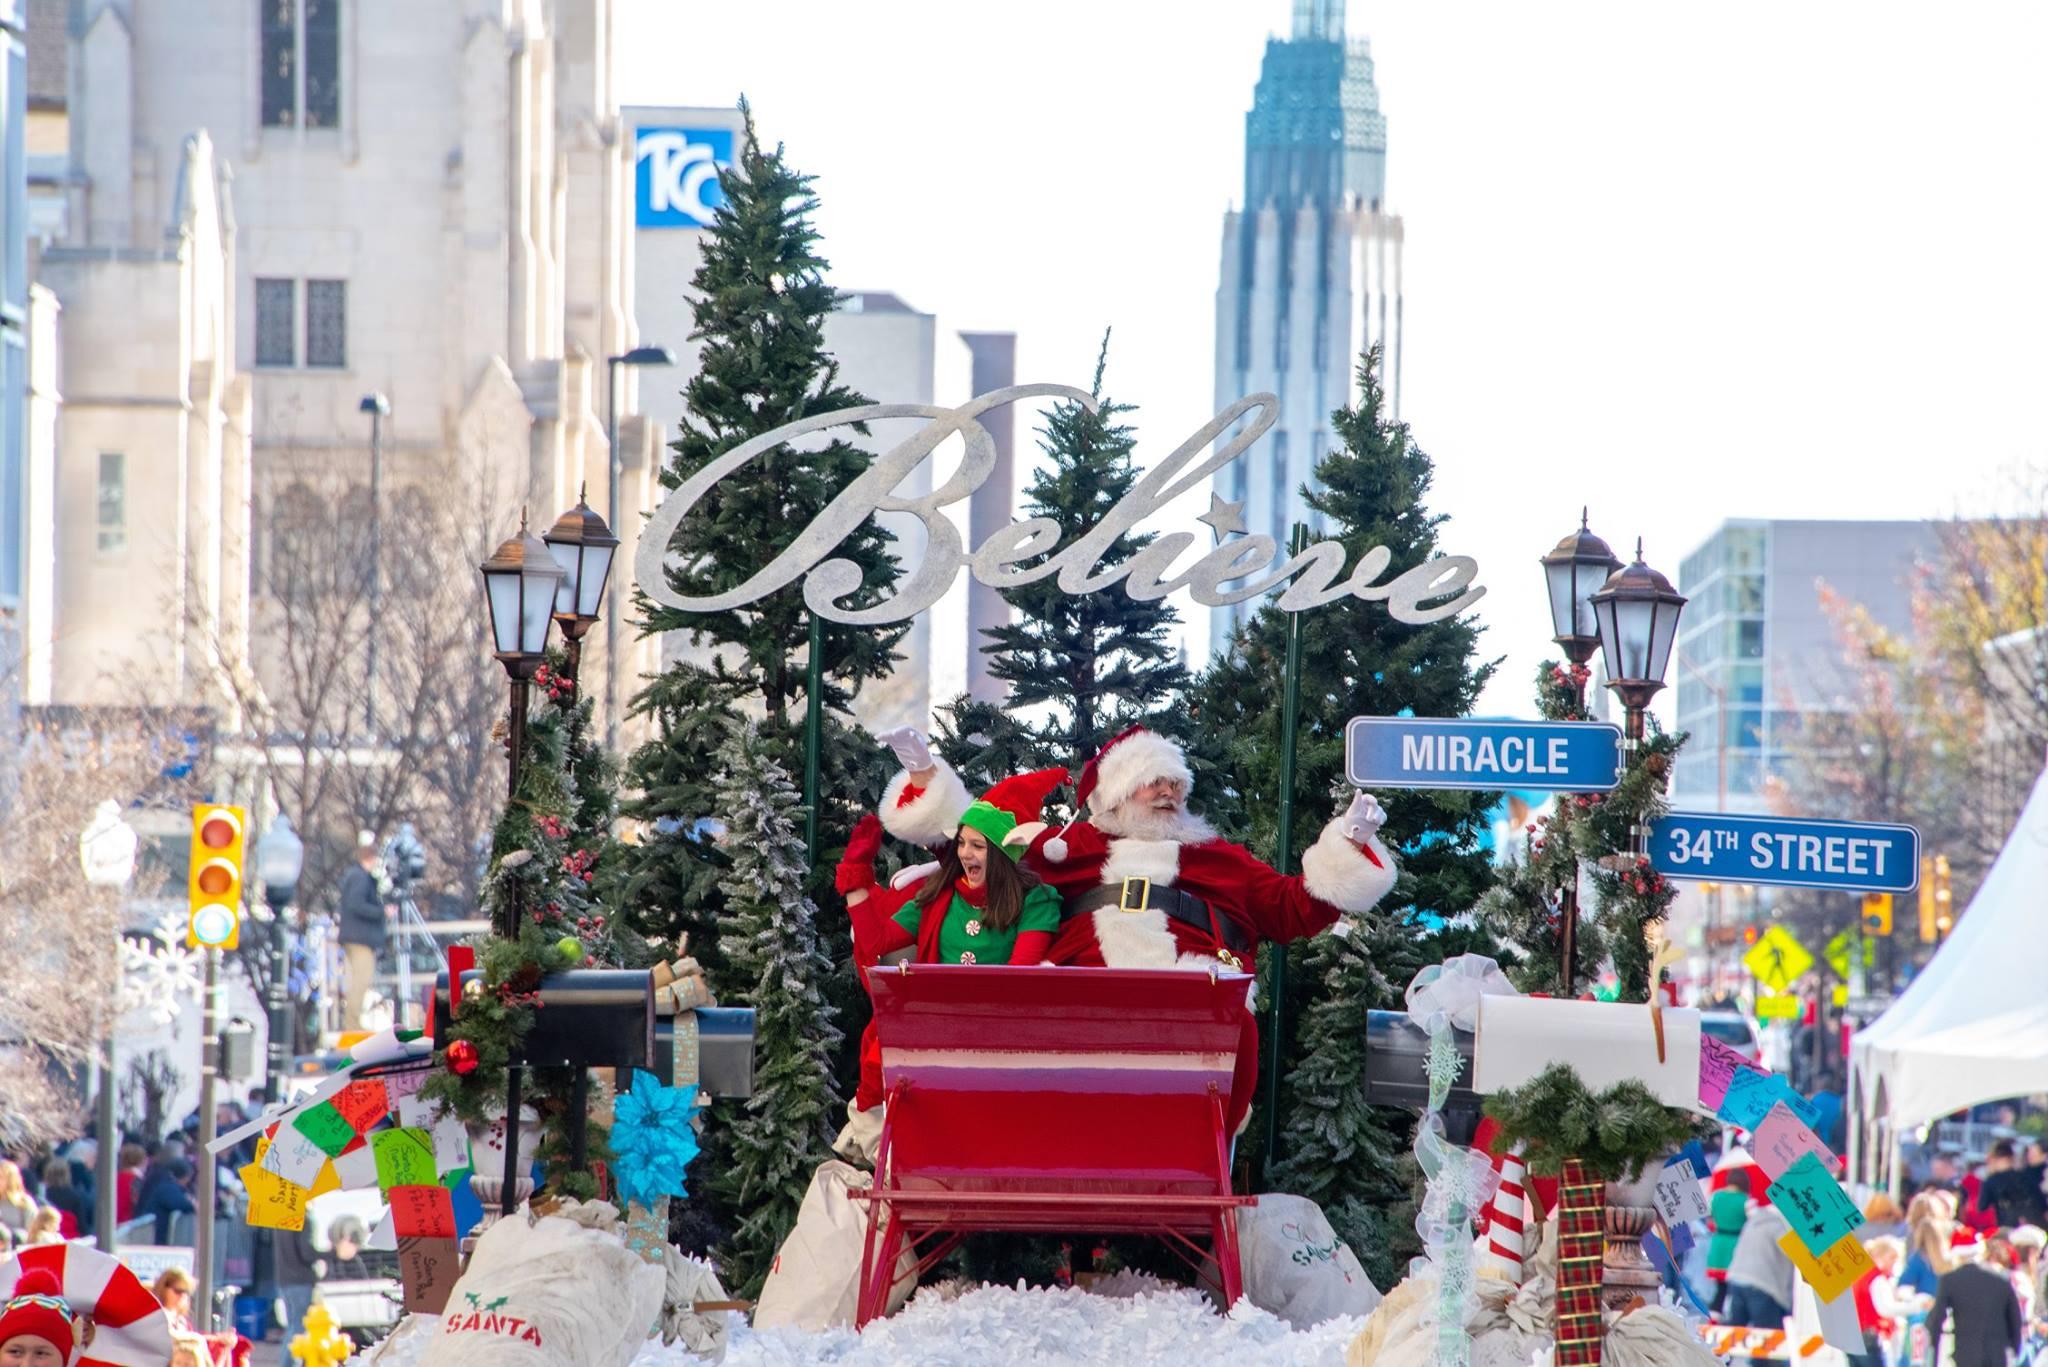 Christmas Day Downtown Parade 2020 Tulsa Makes Plans for 2020 Christmas Parade – Georgia Chron